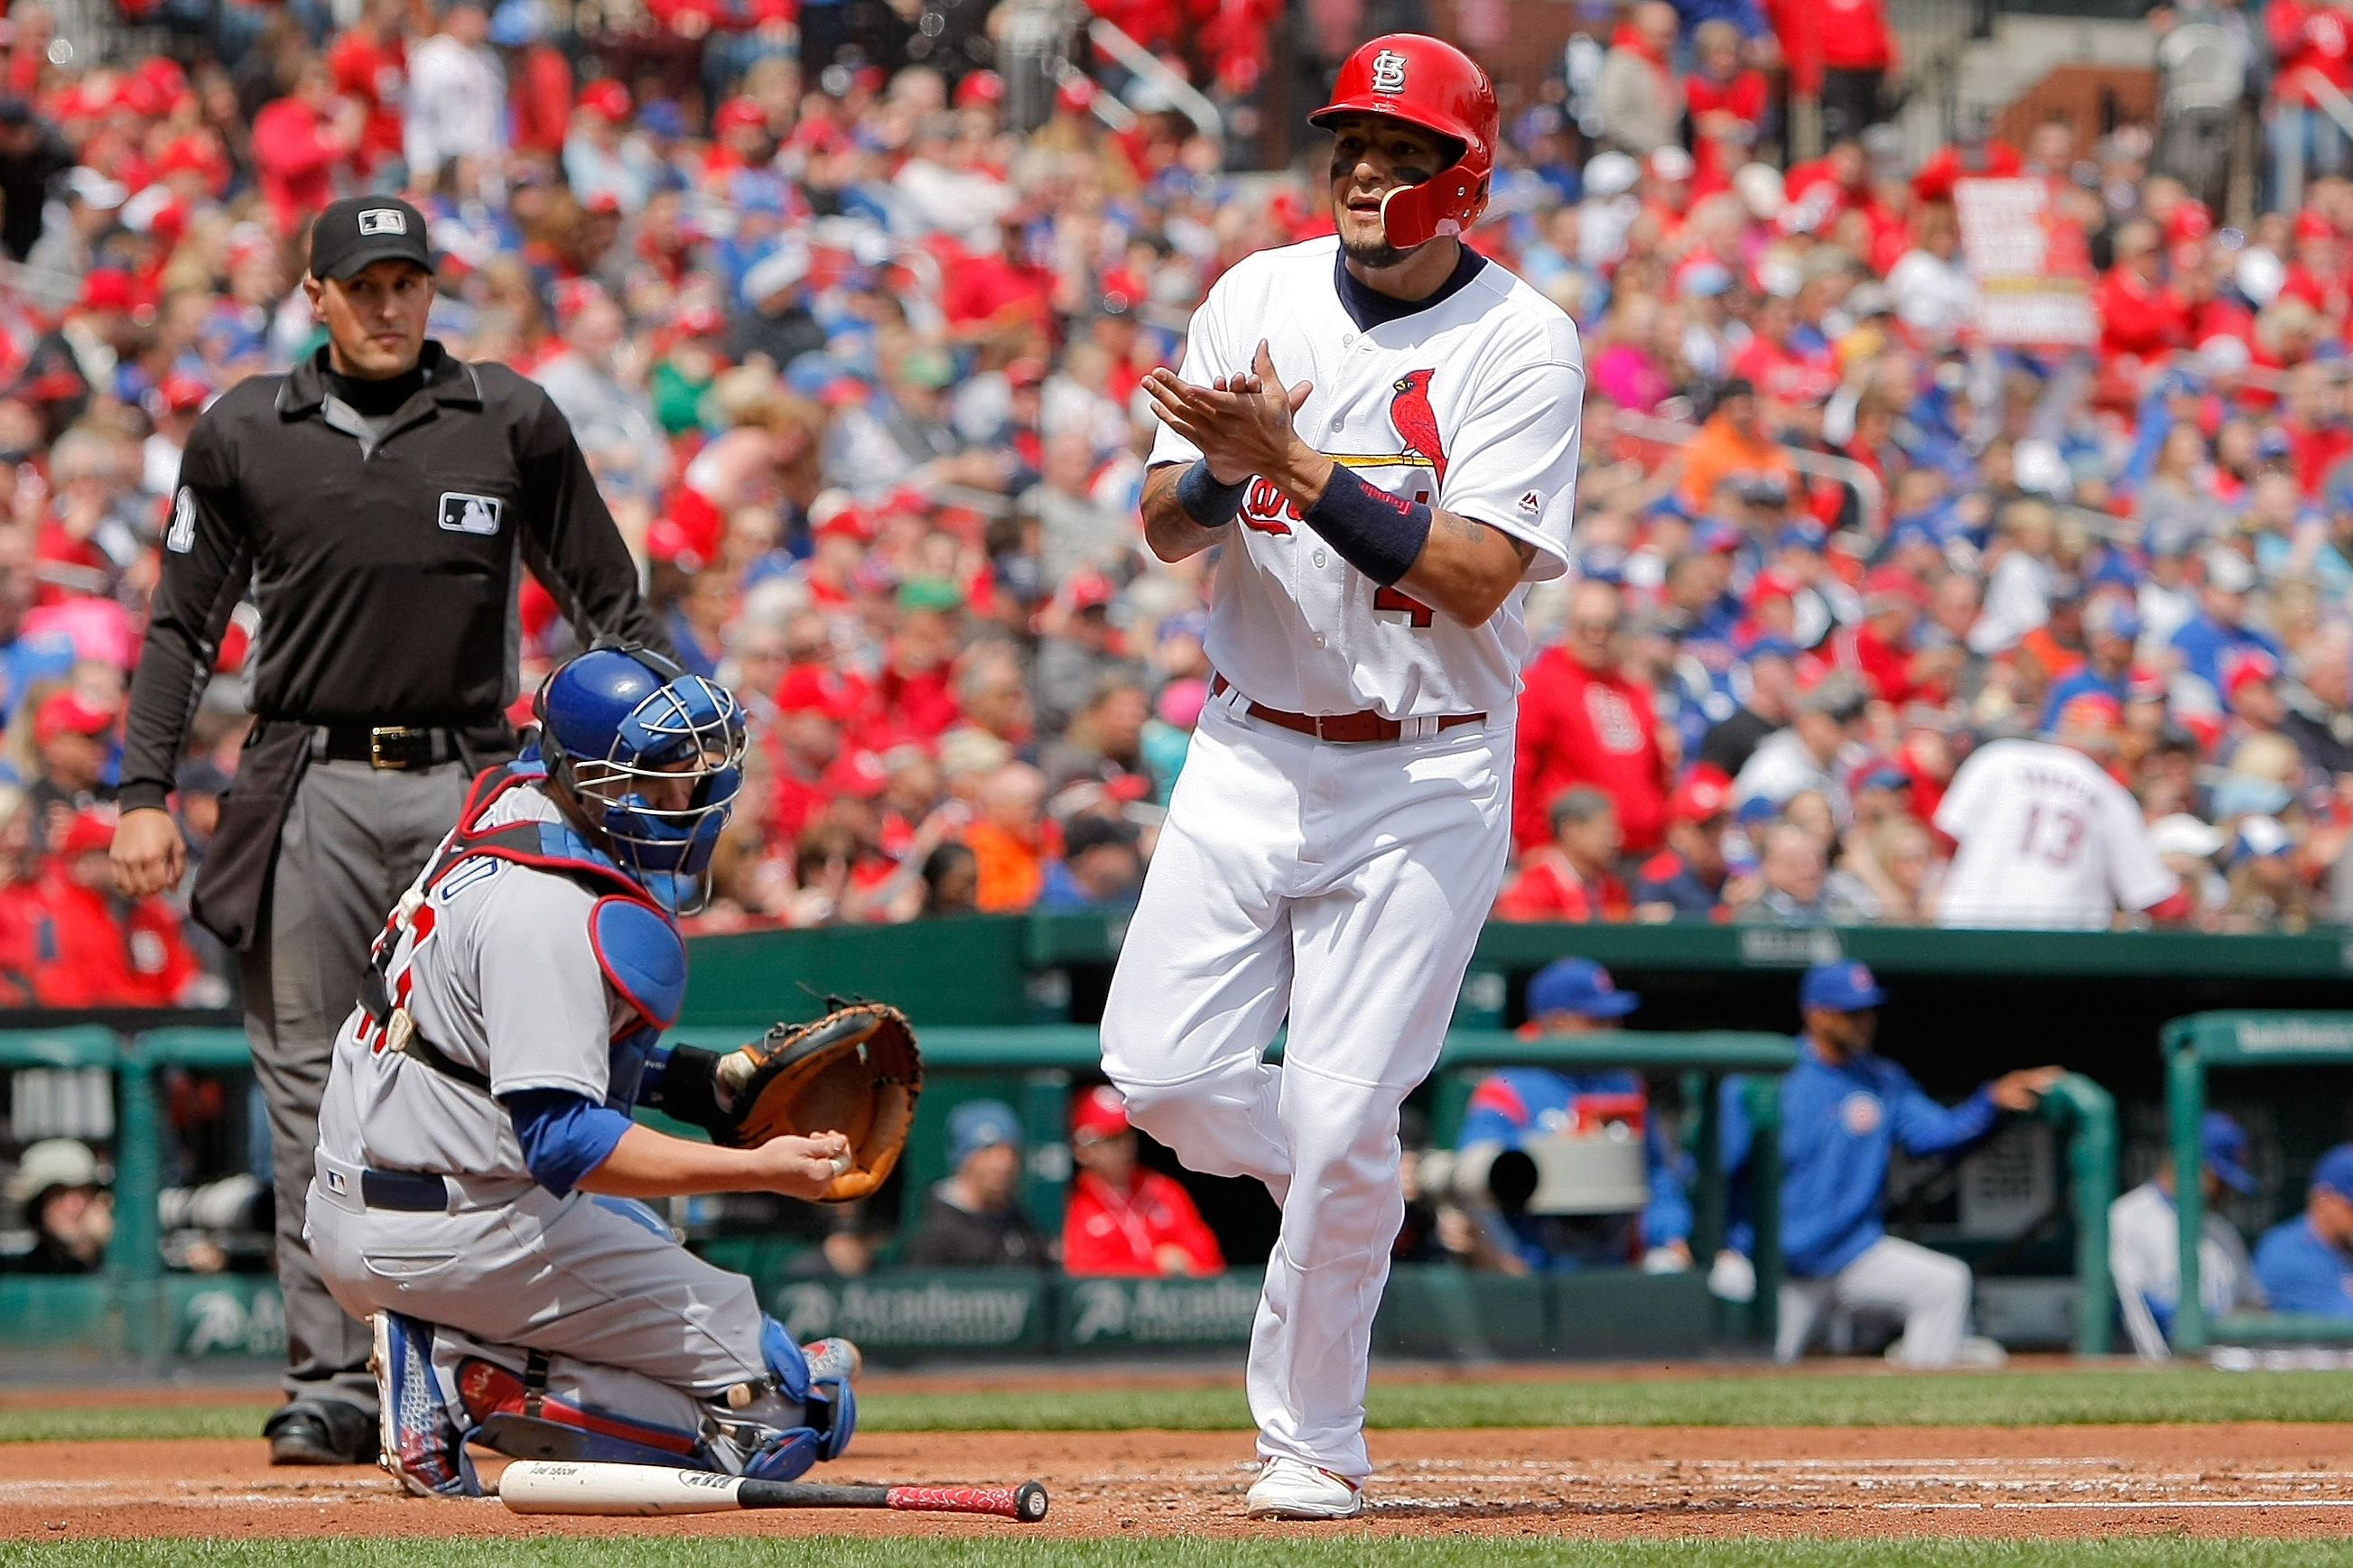 9996452-mlb-chicago-cubs-at-st.-louis-cardinals